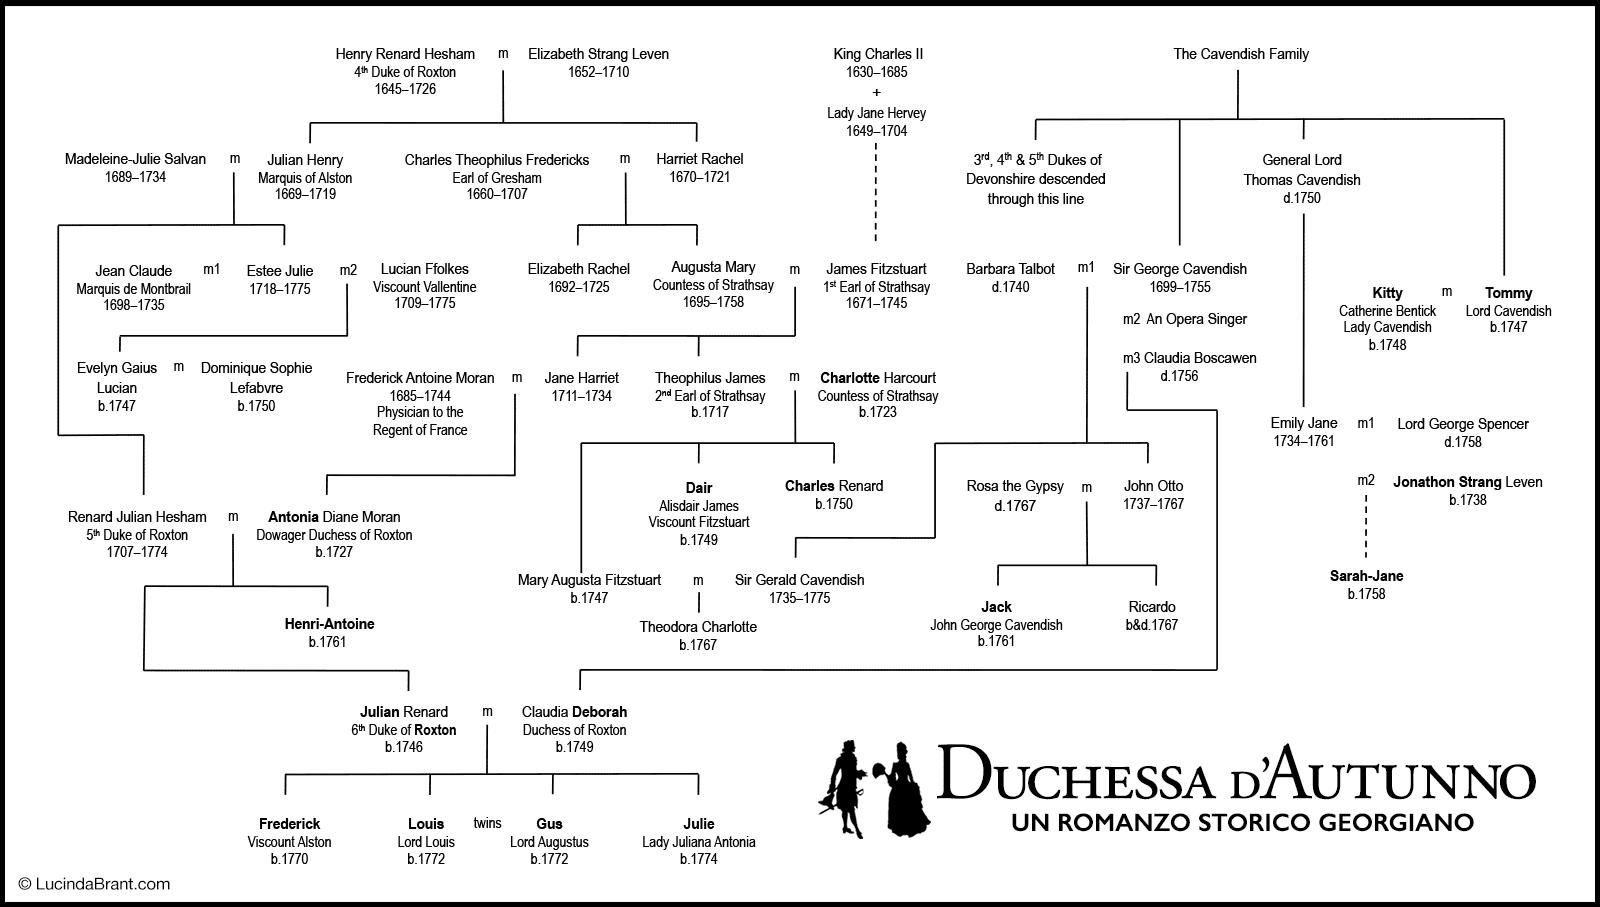 duchessa-dautunno-albero-genealogico.png